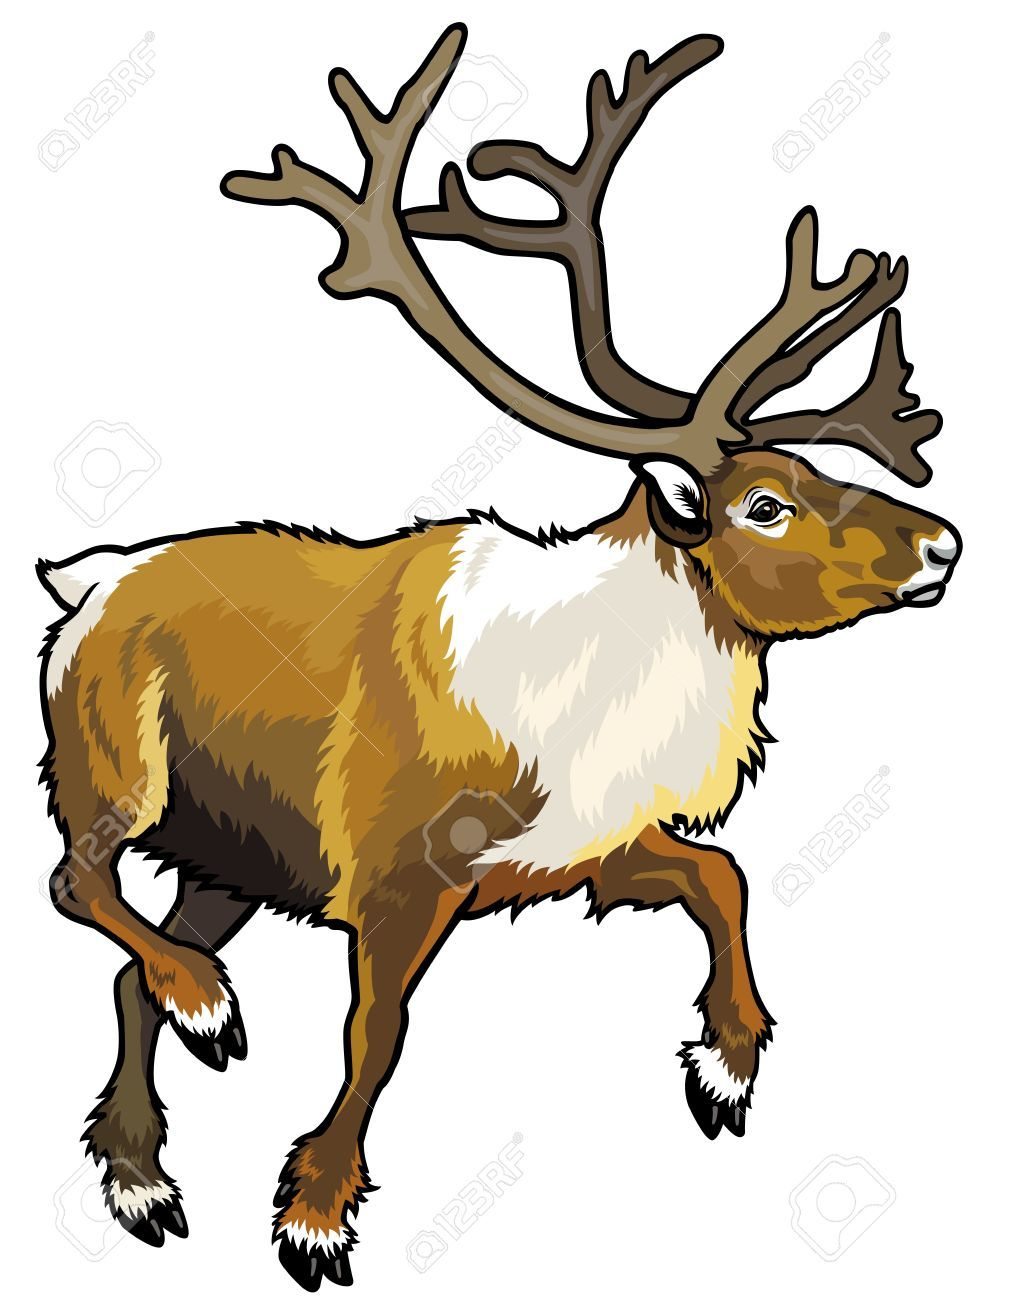 Head clipart caribou #1 in 2019.